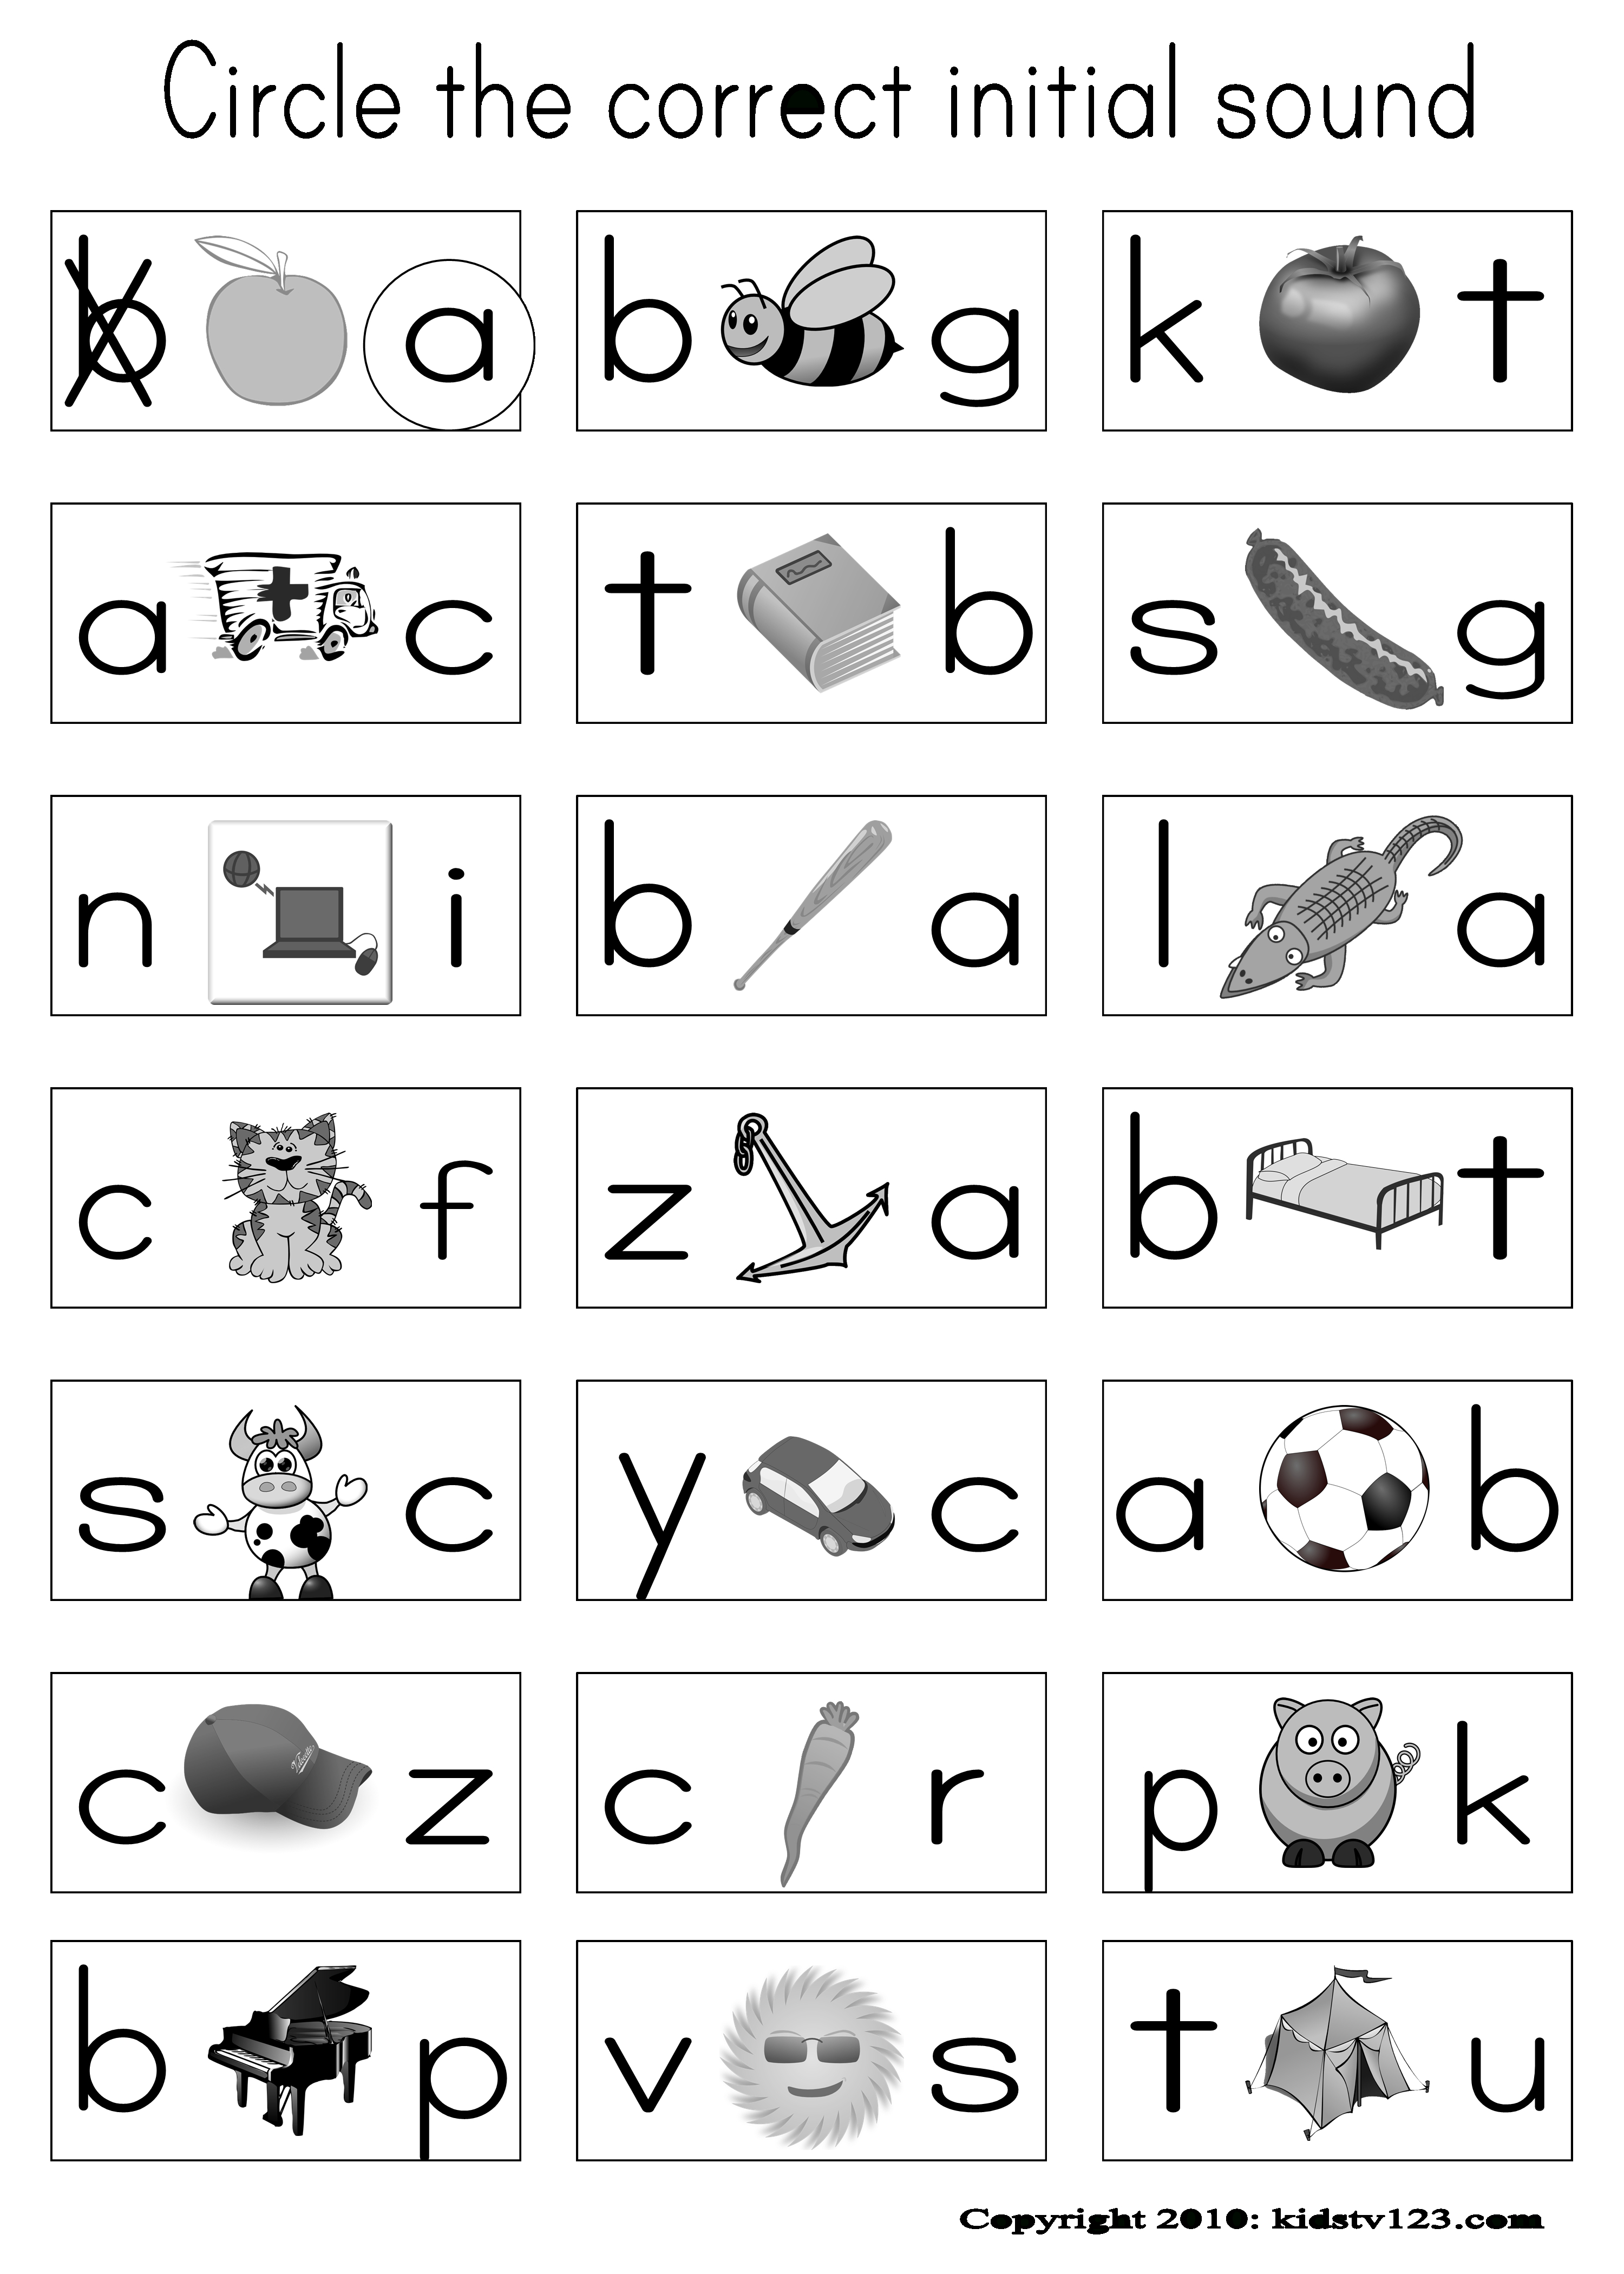 Alphabet & Phonics Worksheets | Teaching Ideas | Pinterest | Phonics - Hooked On Phonics Free Printable Worksheets